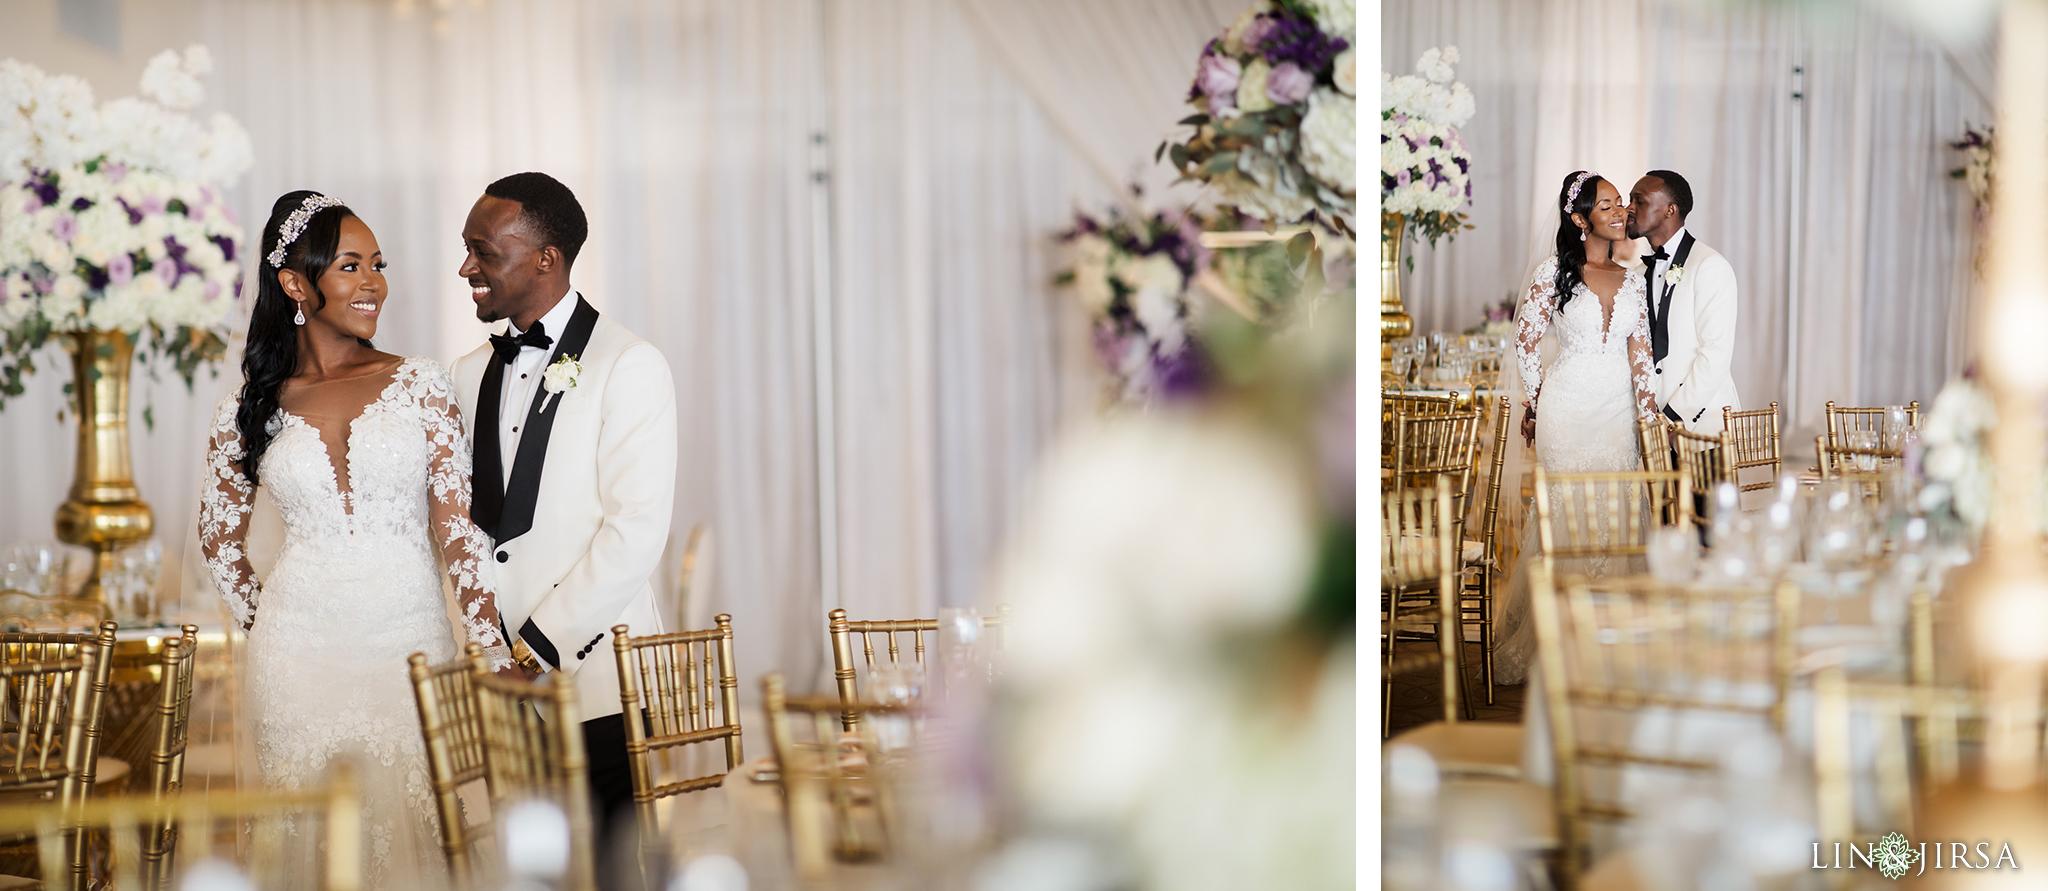 36 Los Verdes Golf Course Palos Verdes Kenyan Wedding Photography